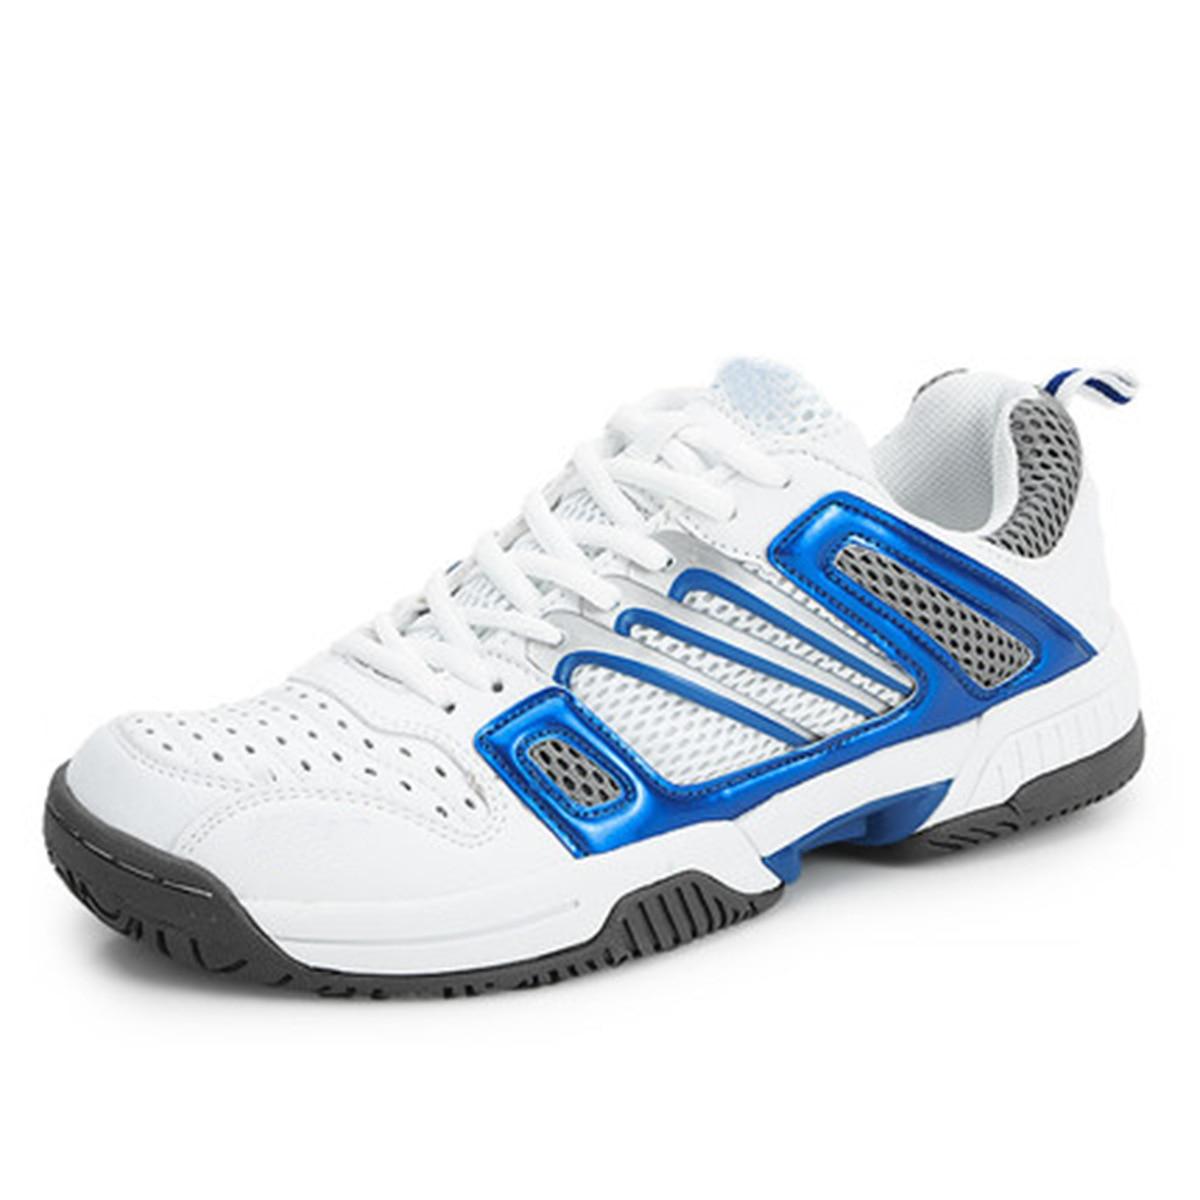 ФОТО Men Women Unisex Badminton Shoes Anti Slipper Soft Sneakers Professional Tennis Sport Training Shoes(91)